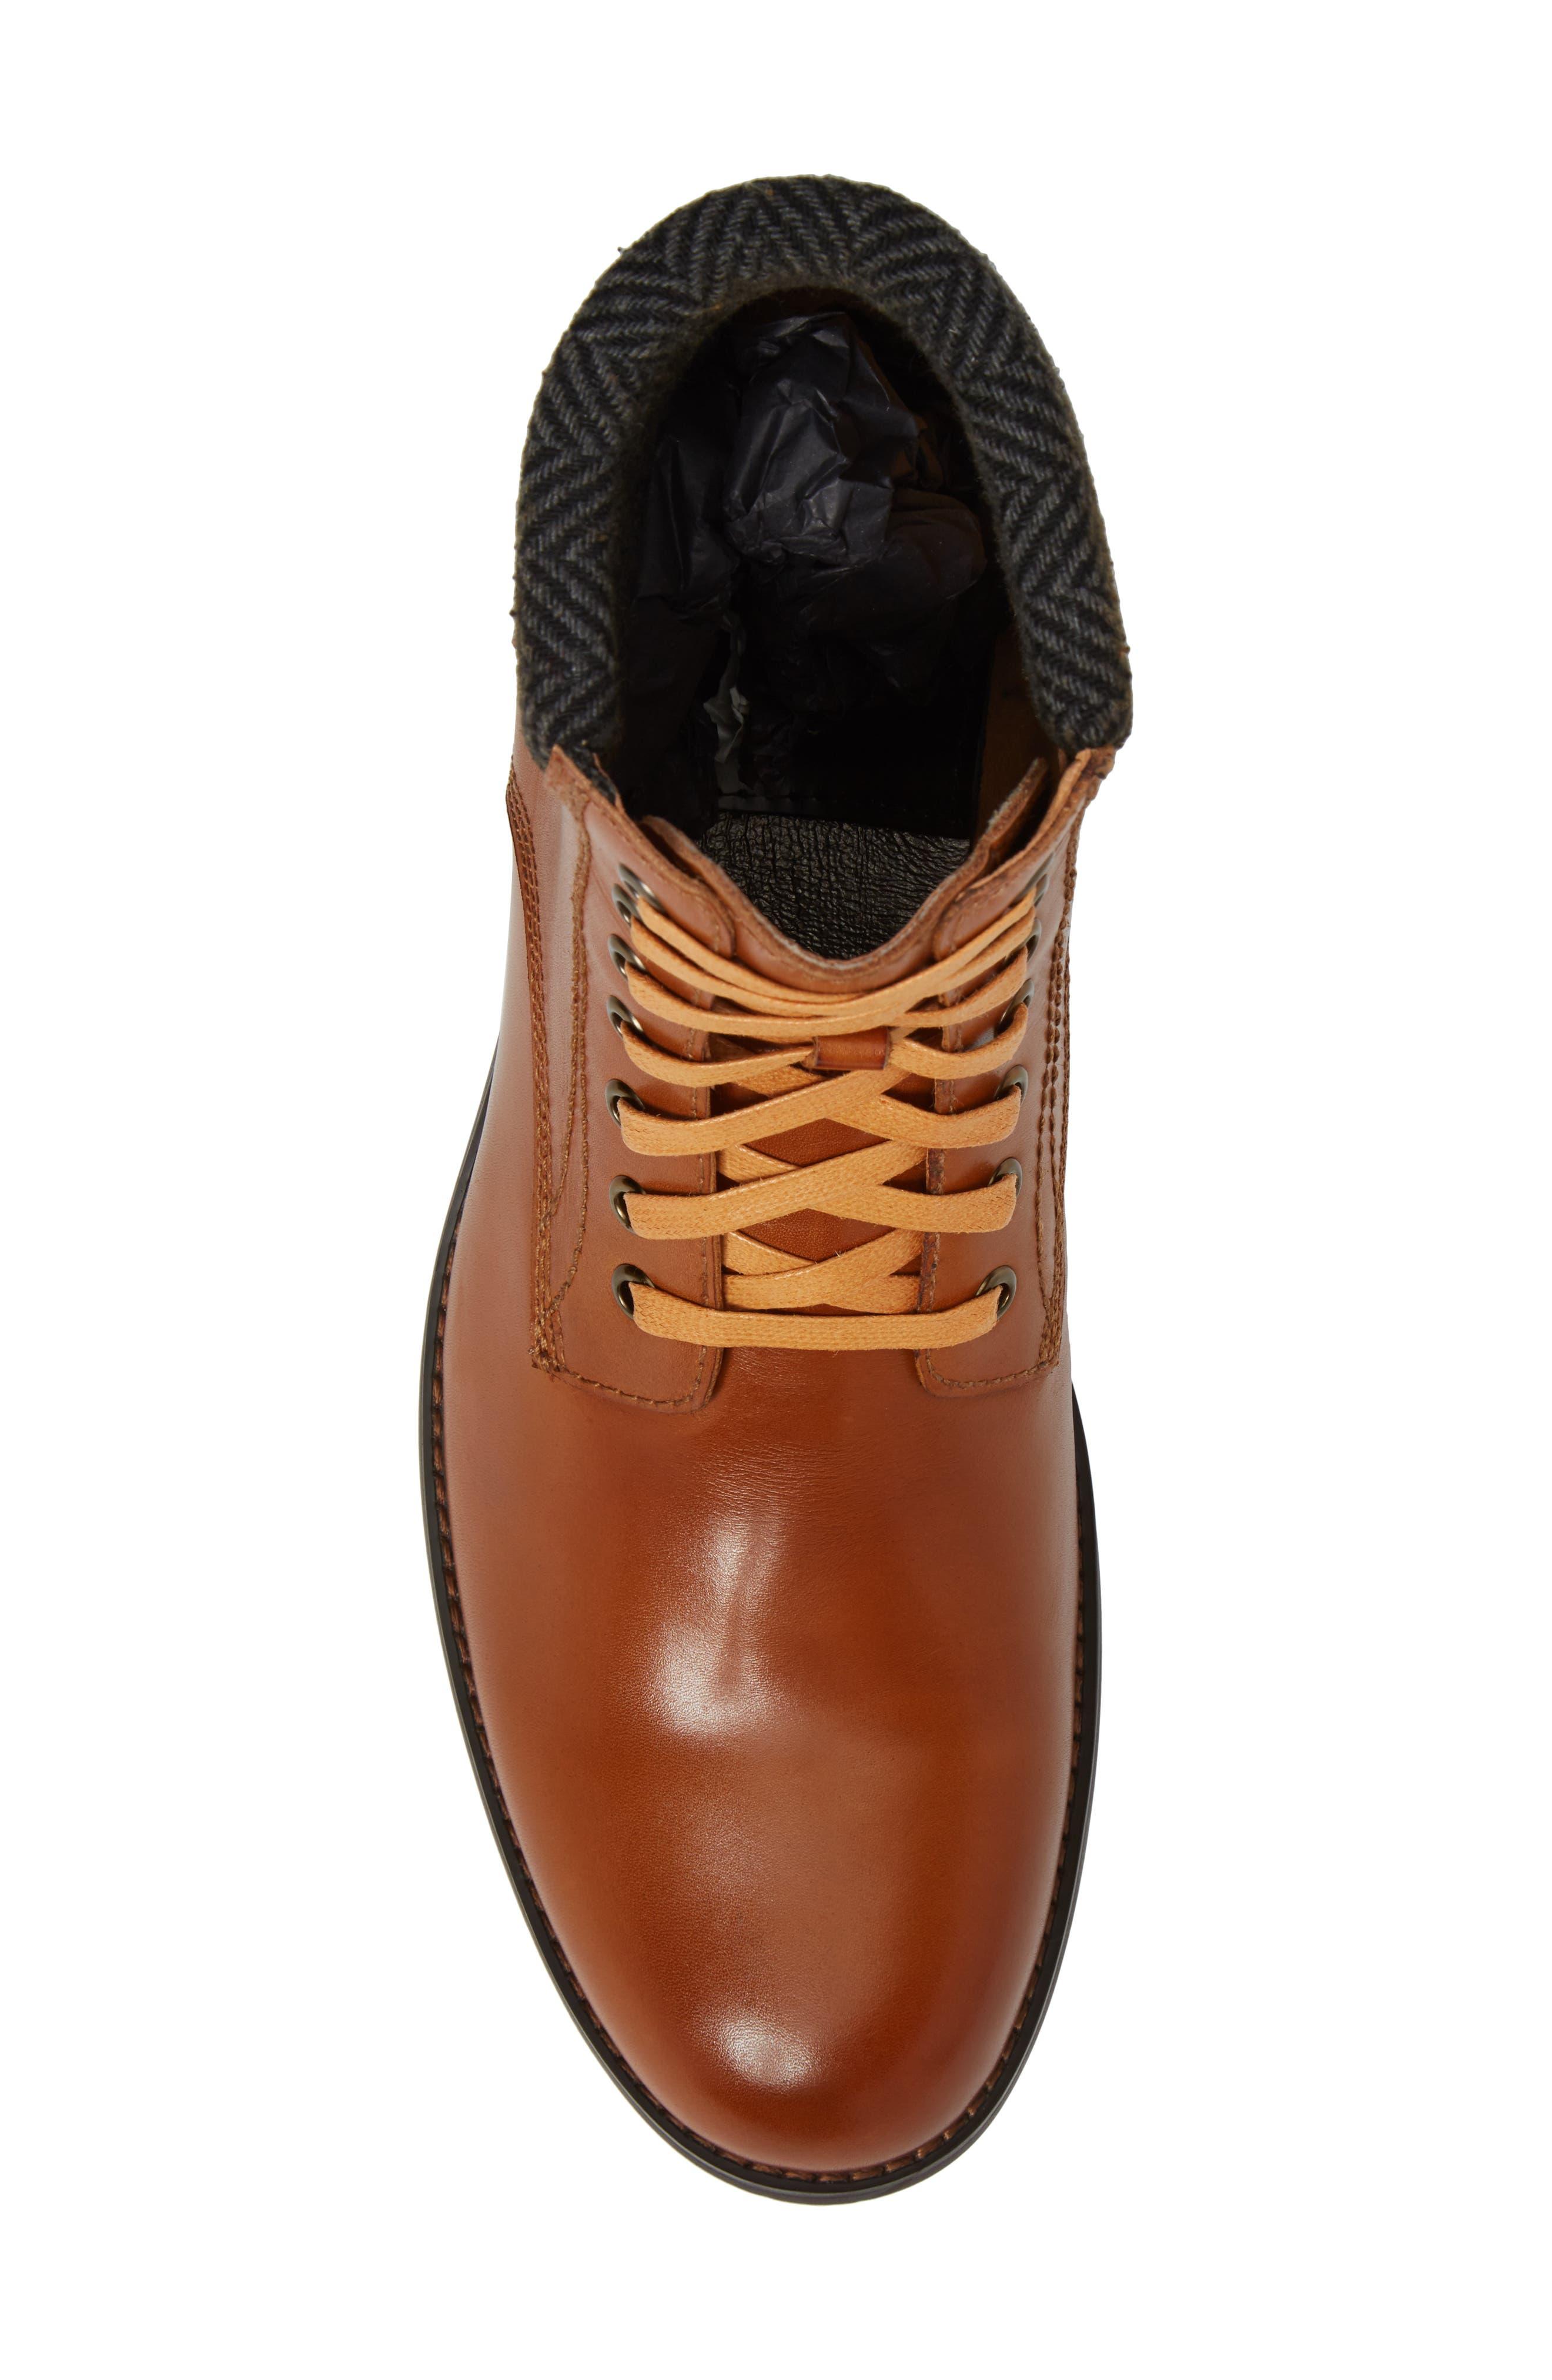 Saar Plain Toe Boot,                             Alternate thumbnail 5, color,                             Cognac Leather